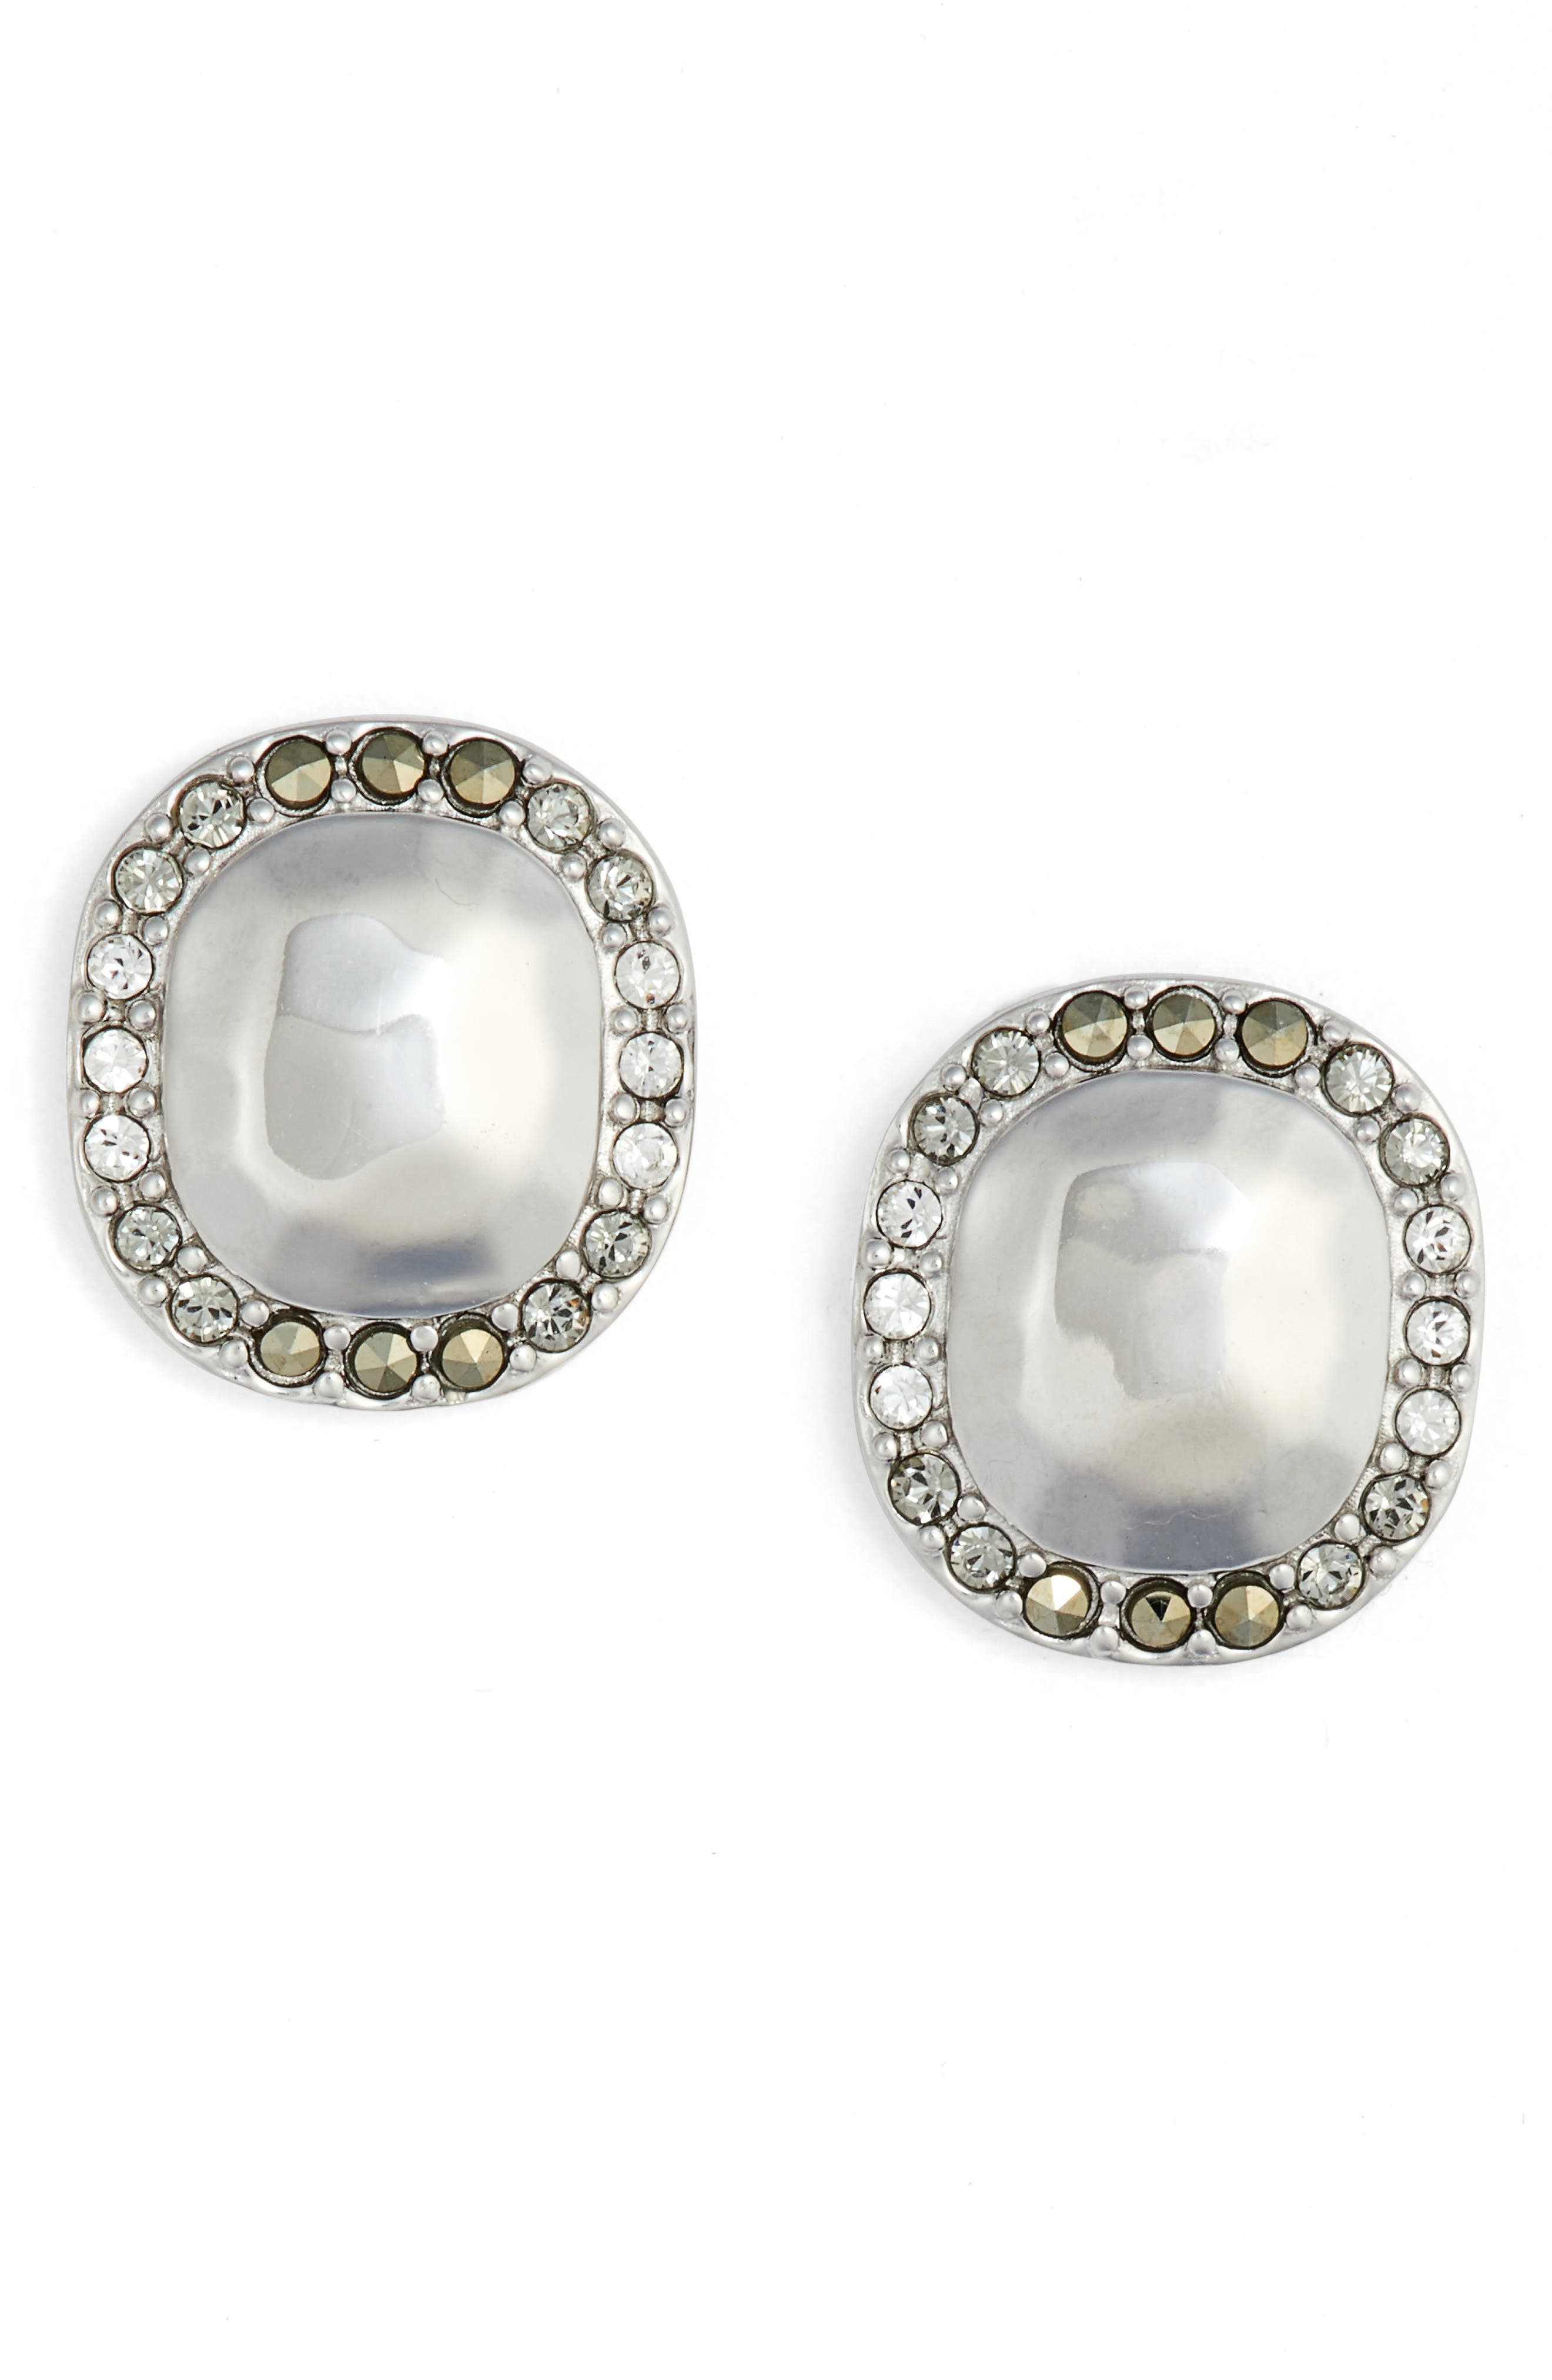 Jewel Stud Earrings,                             Main thumbnail 1, color,                             Silver